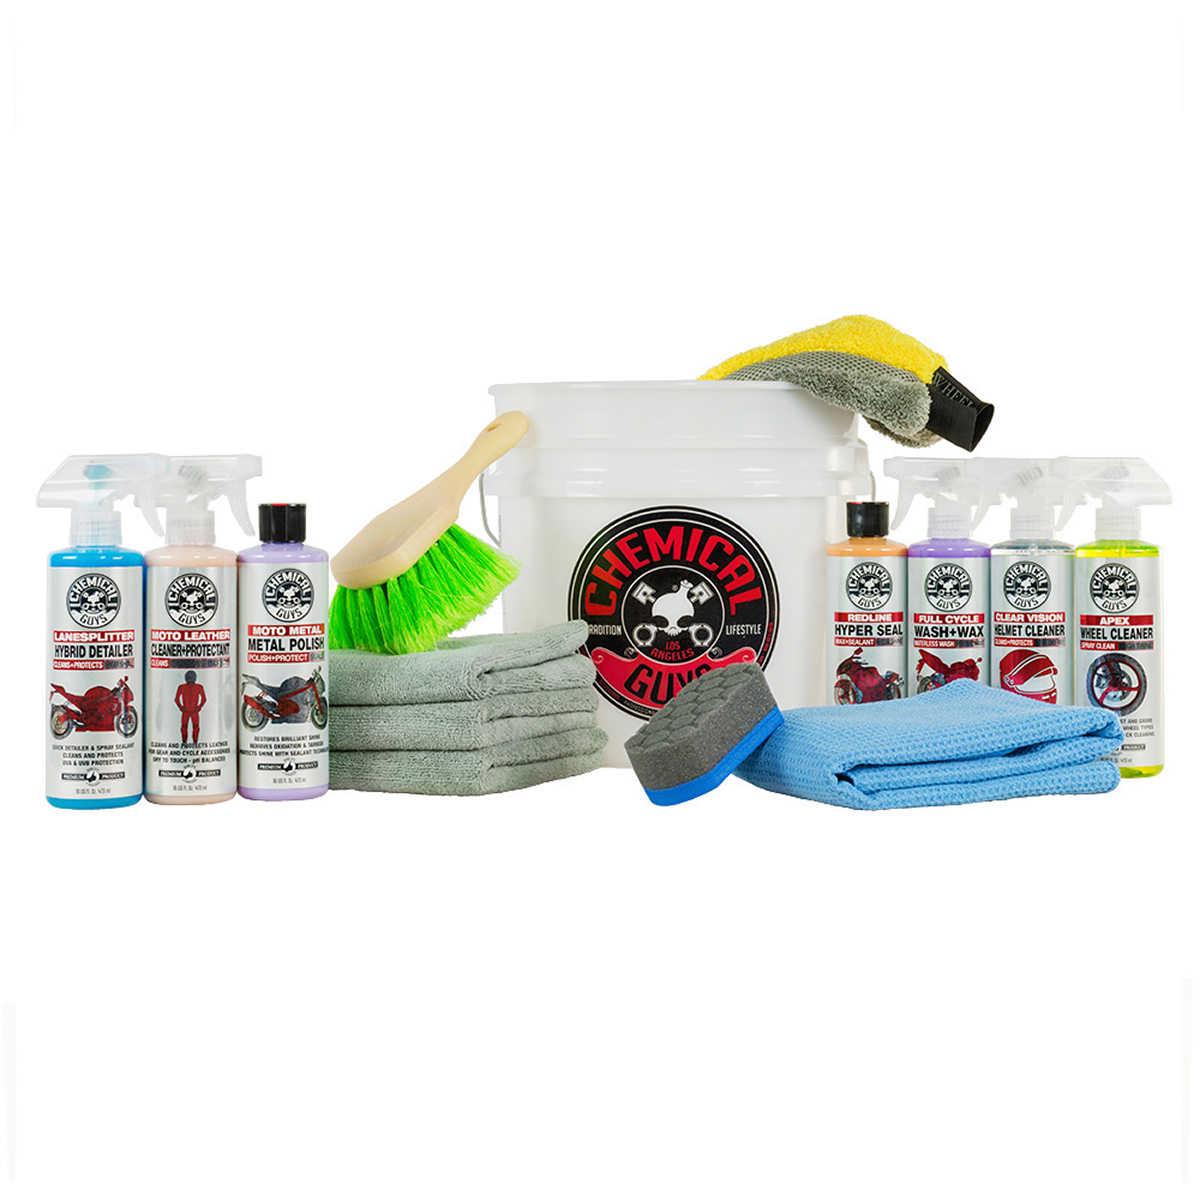 Chemical guys car air freshener kit 0 member only item